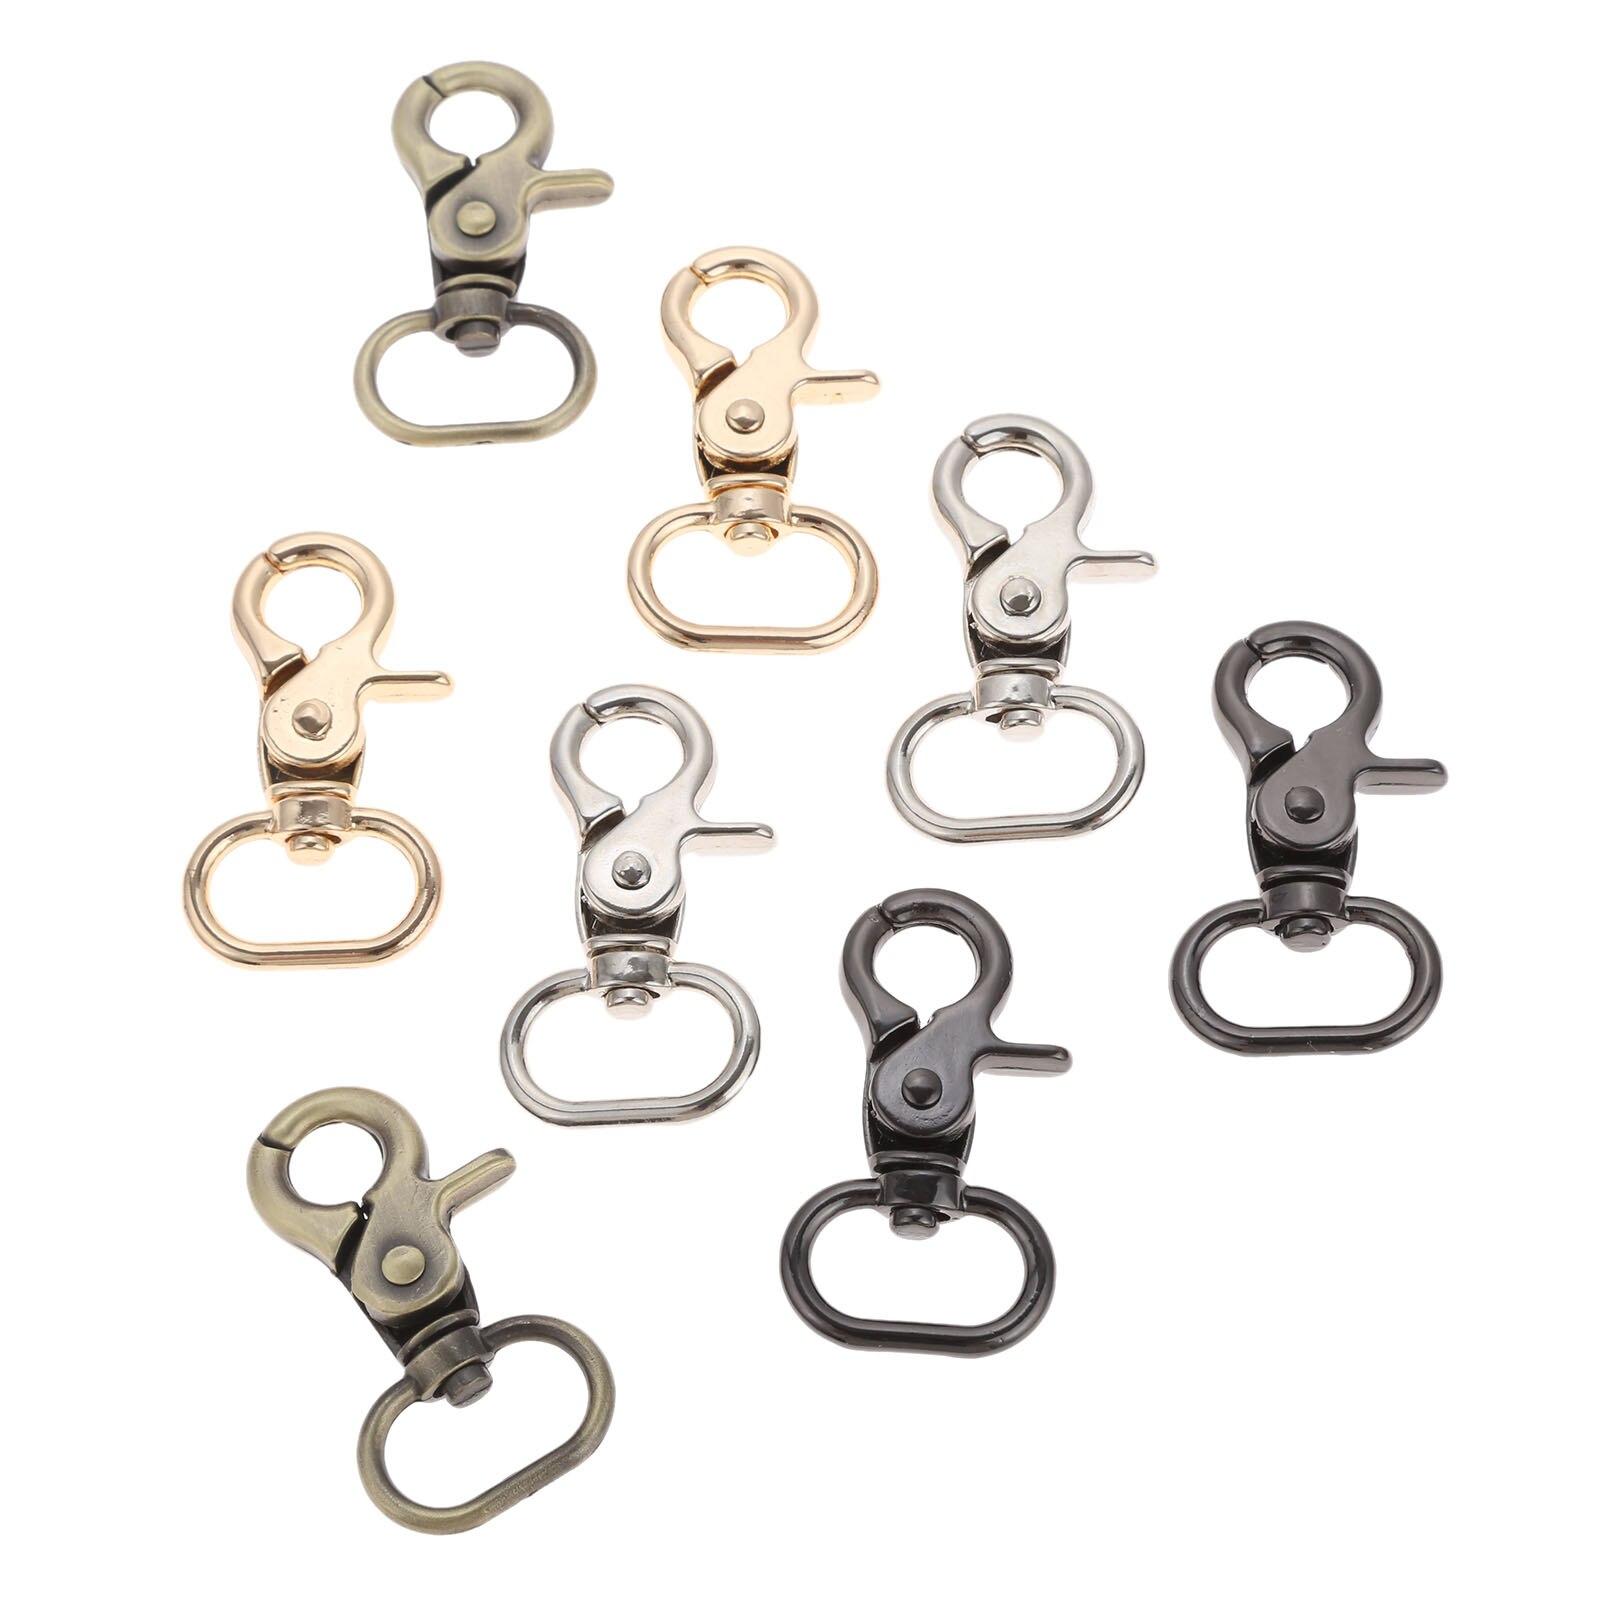 5Pcs Metal Belt Buckle Strap Bag Clasps Lobster Swivel Trigger Clips Snap Hooks Handbag Buckles Key Rings Keychains Accessories